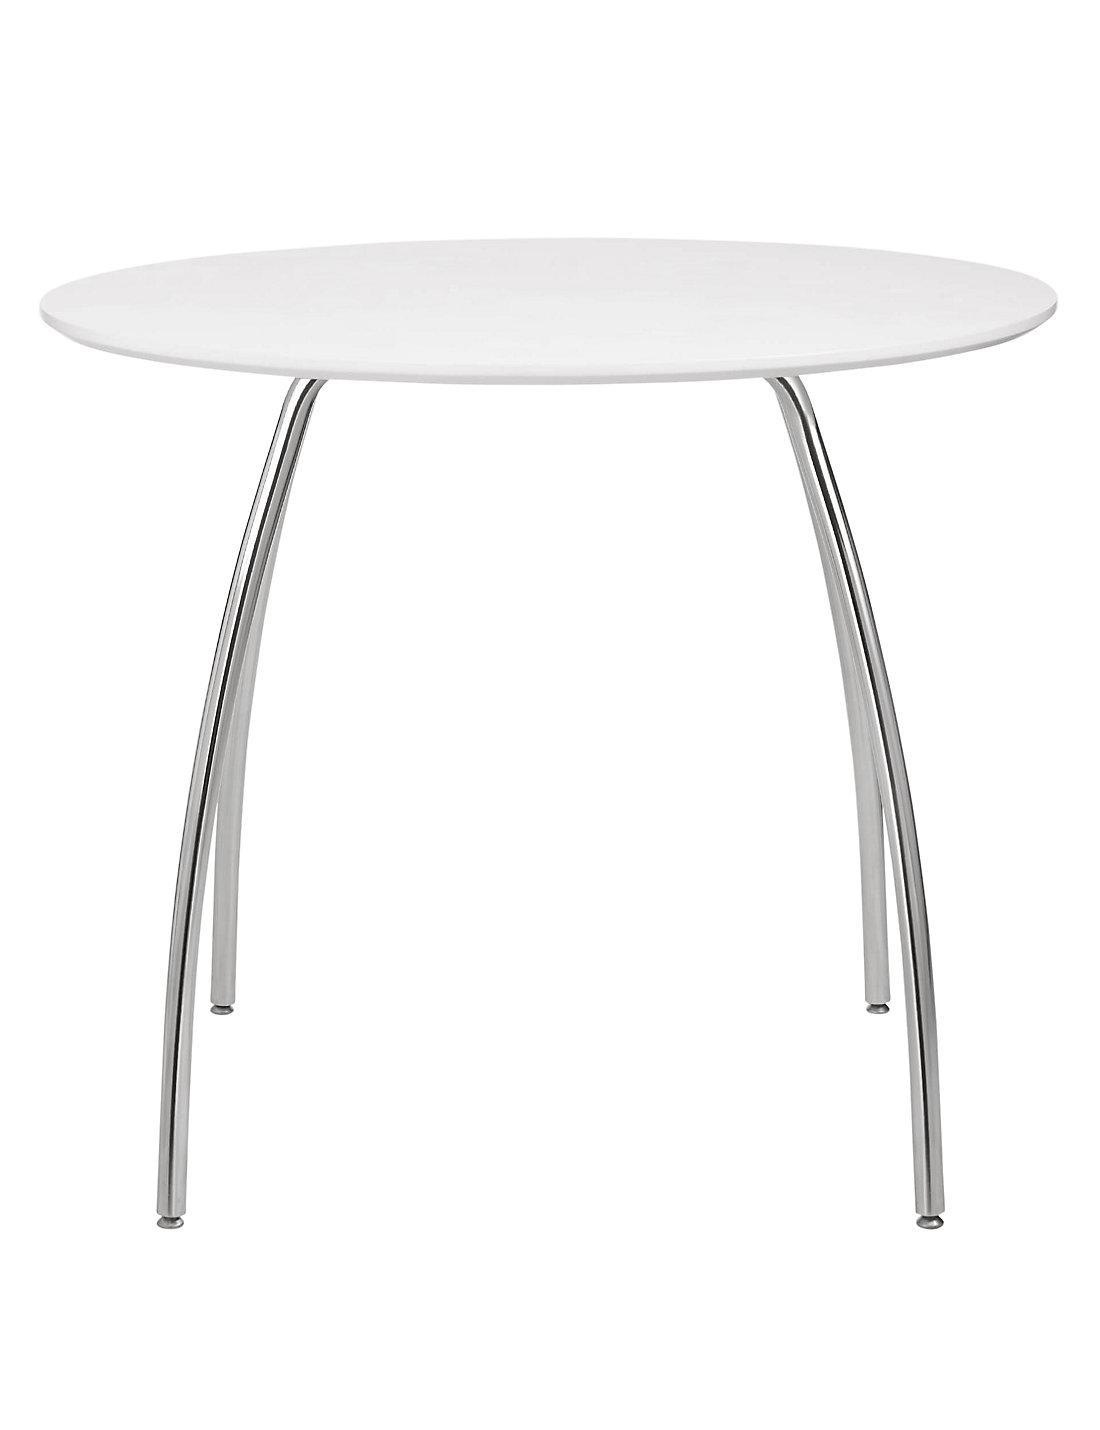 Brady table white ms brady table white geotapseo Choice Image